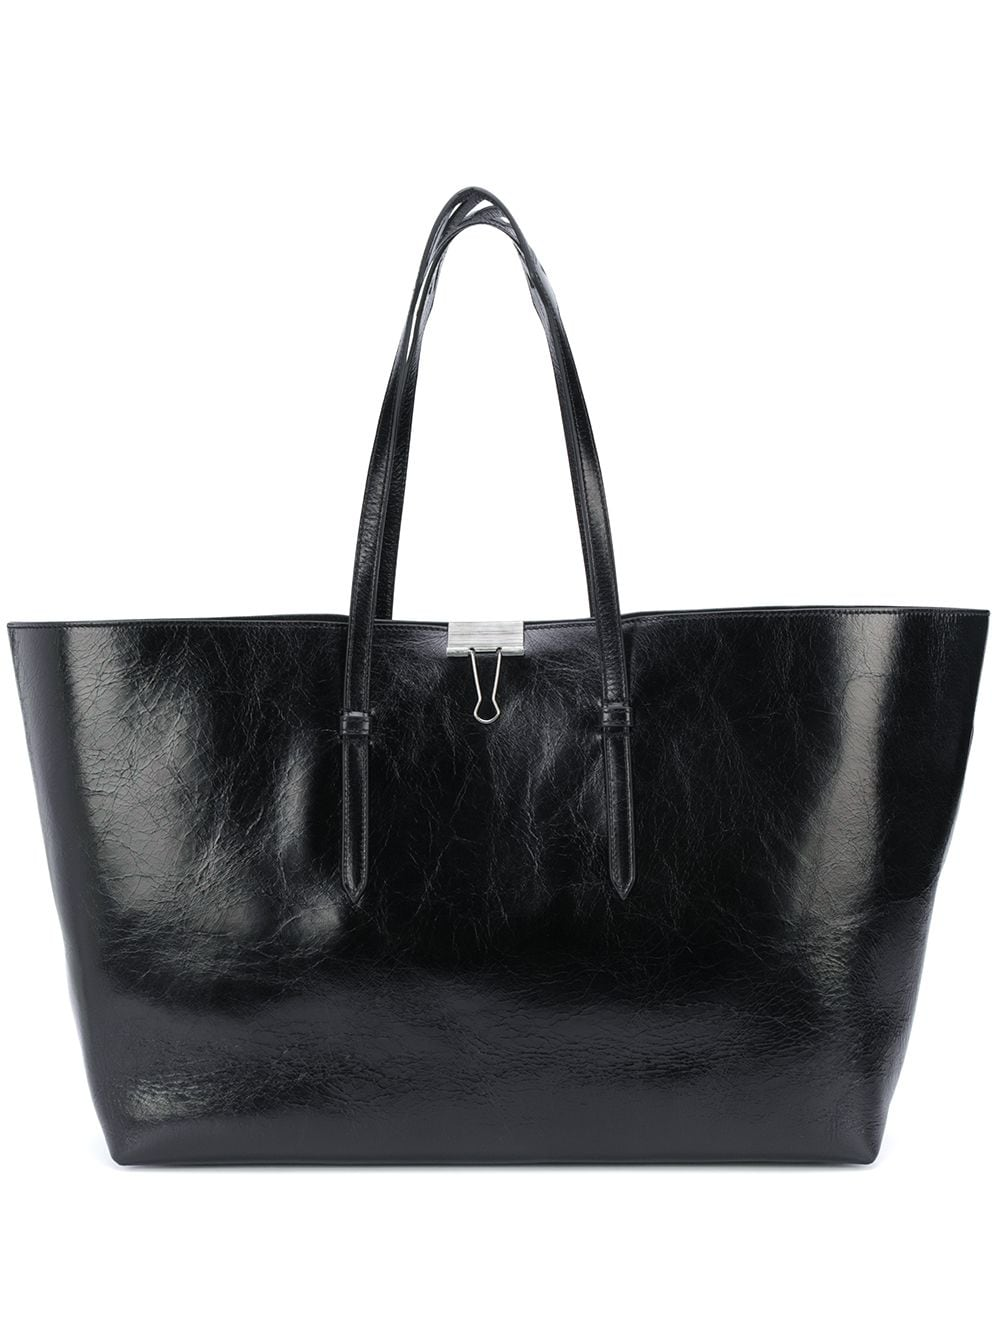 Binder Leather Shopping Bag